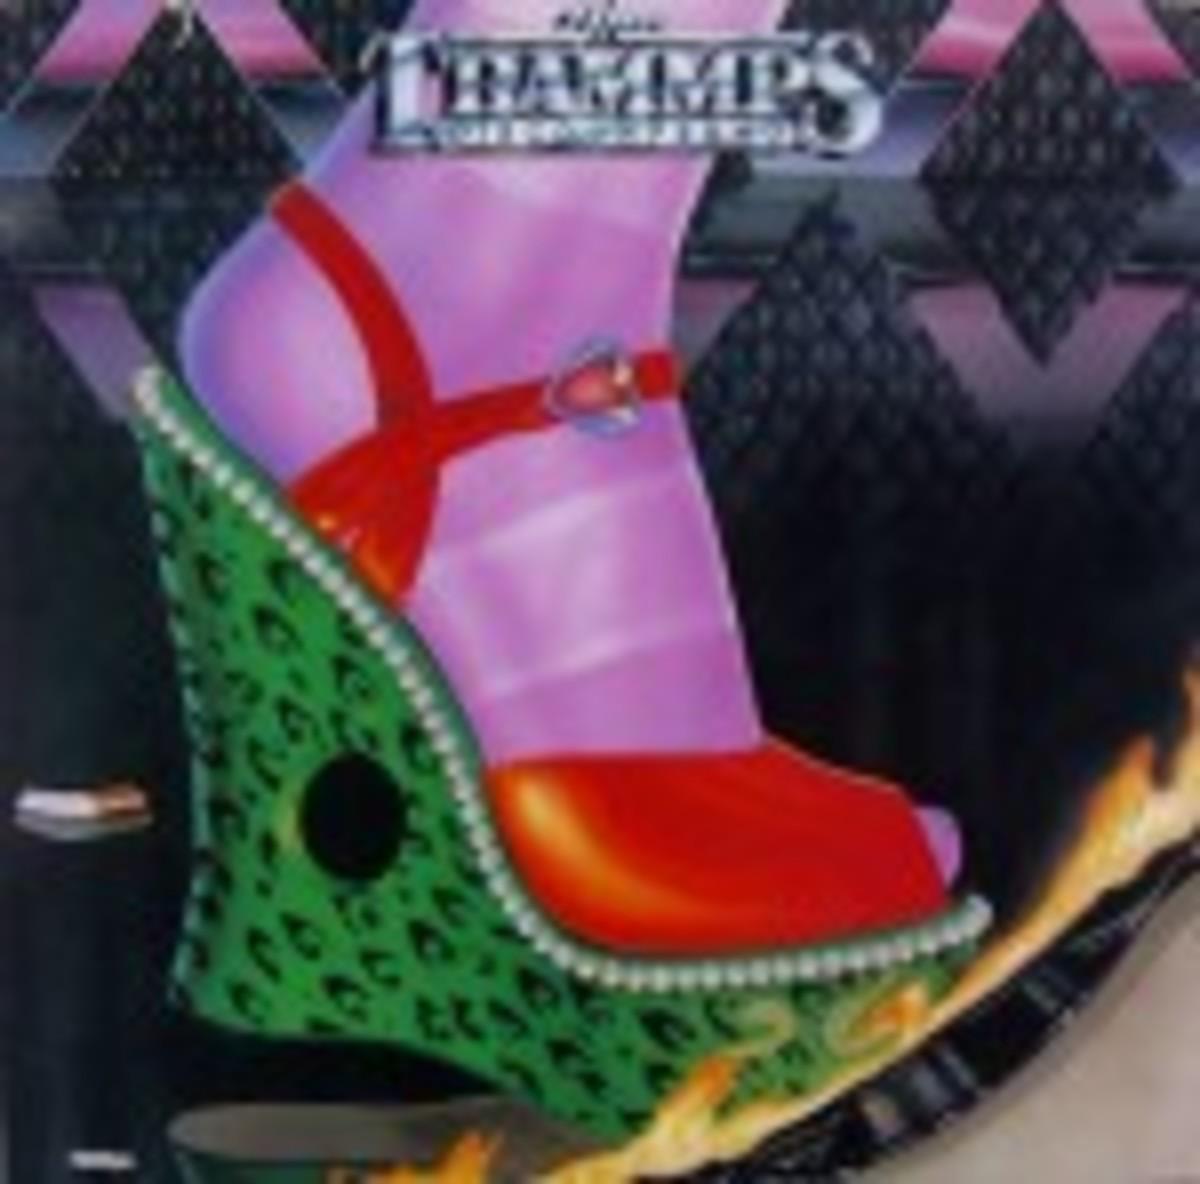 Trampps Disco Inferno